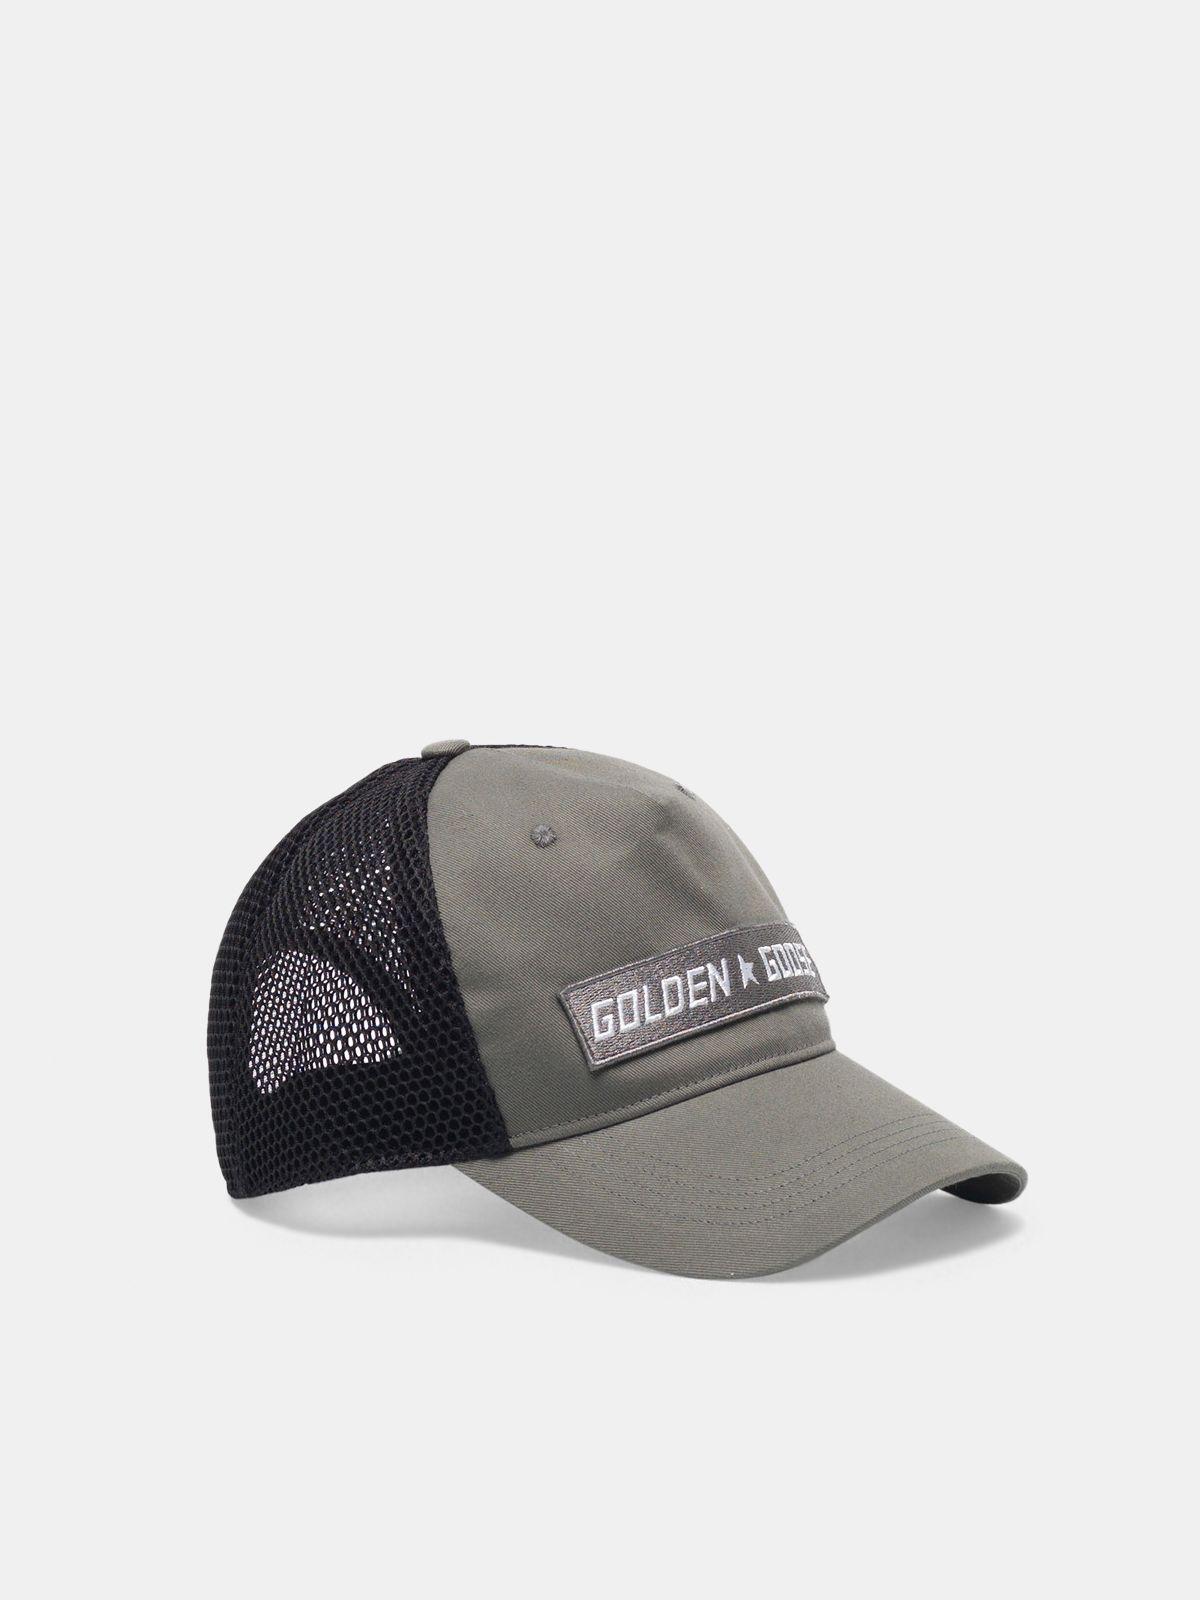 Golden Goose - Golden baseball cap with logo patch in